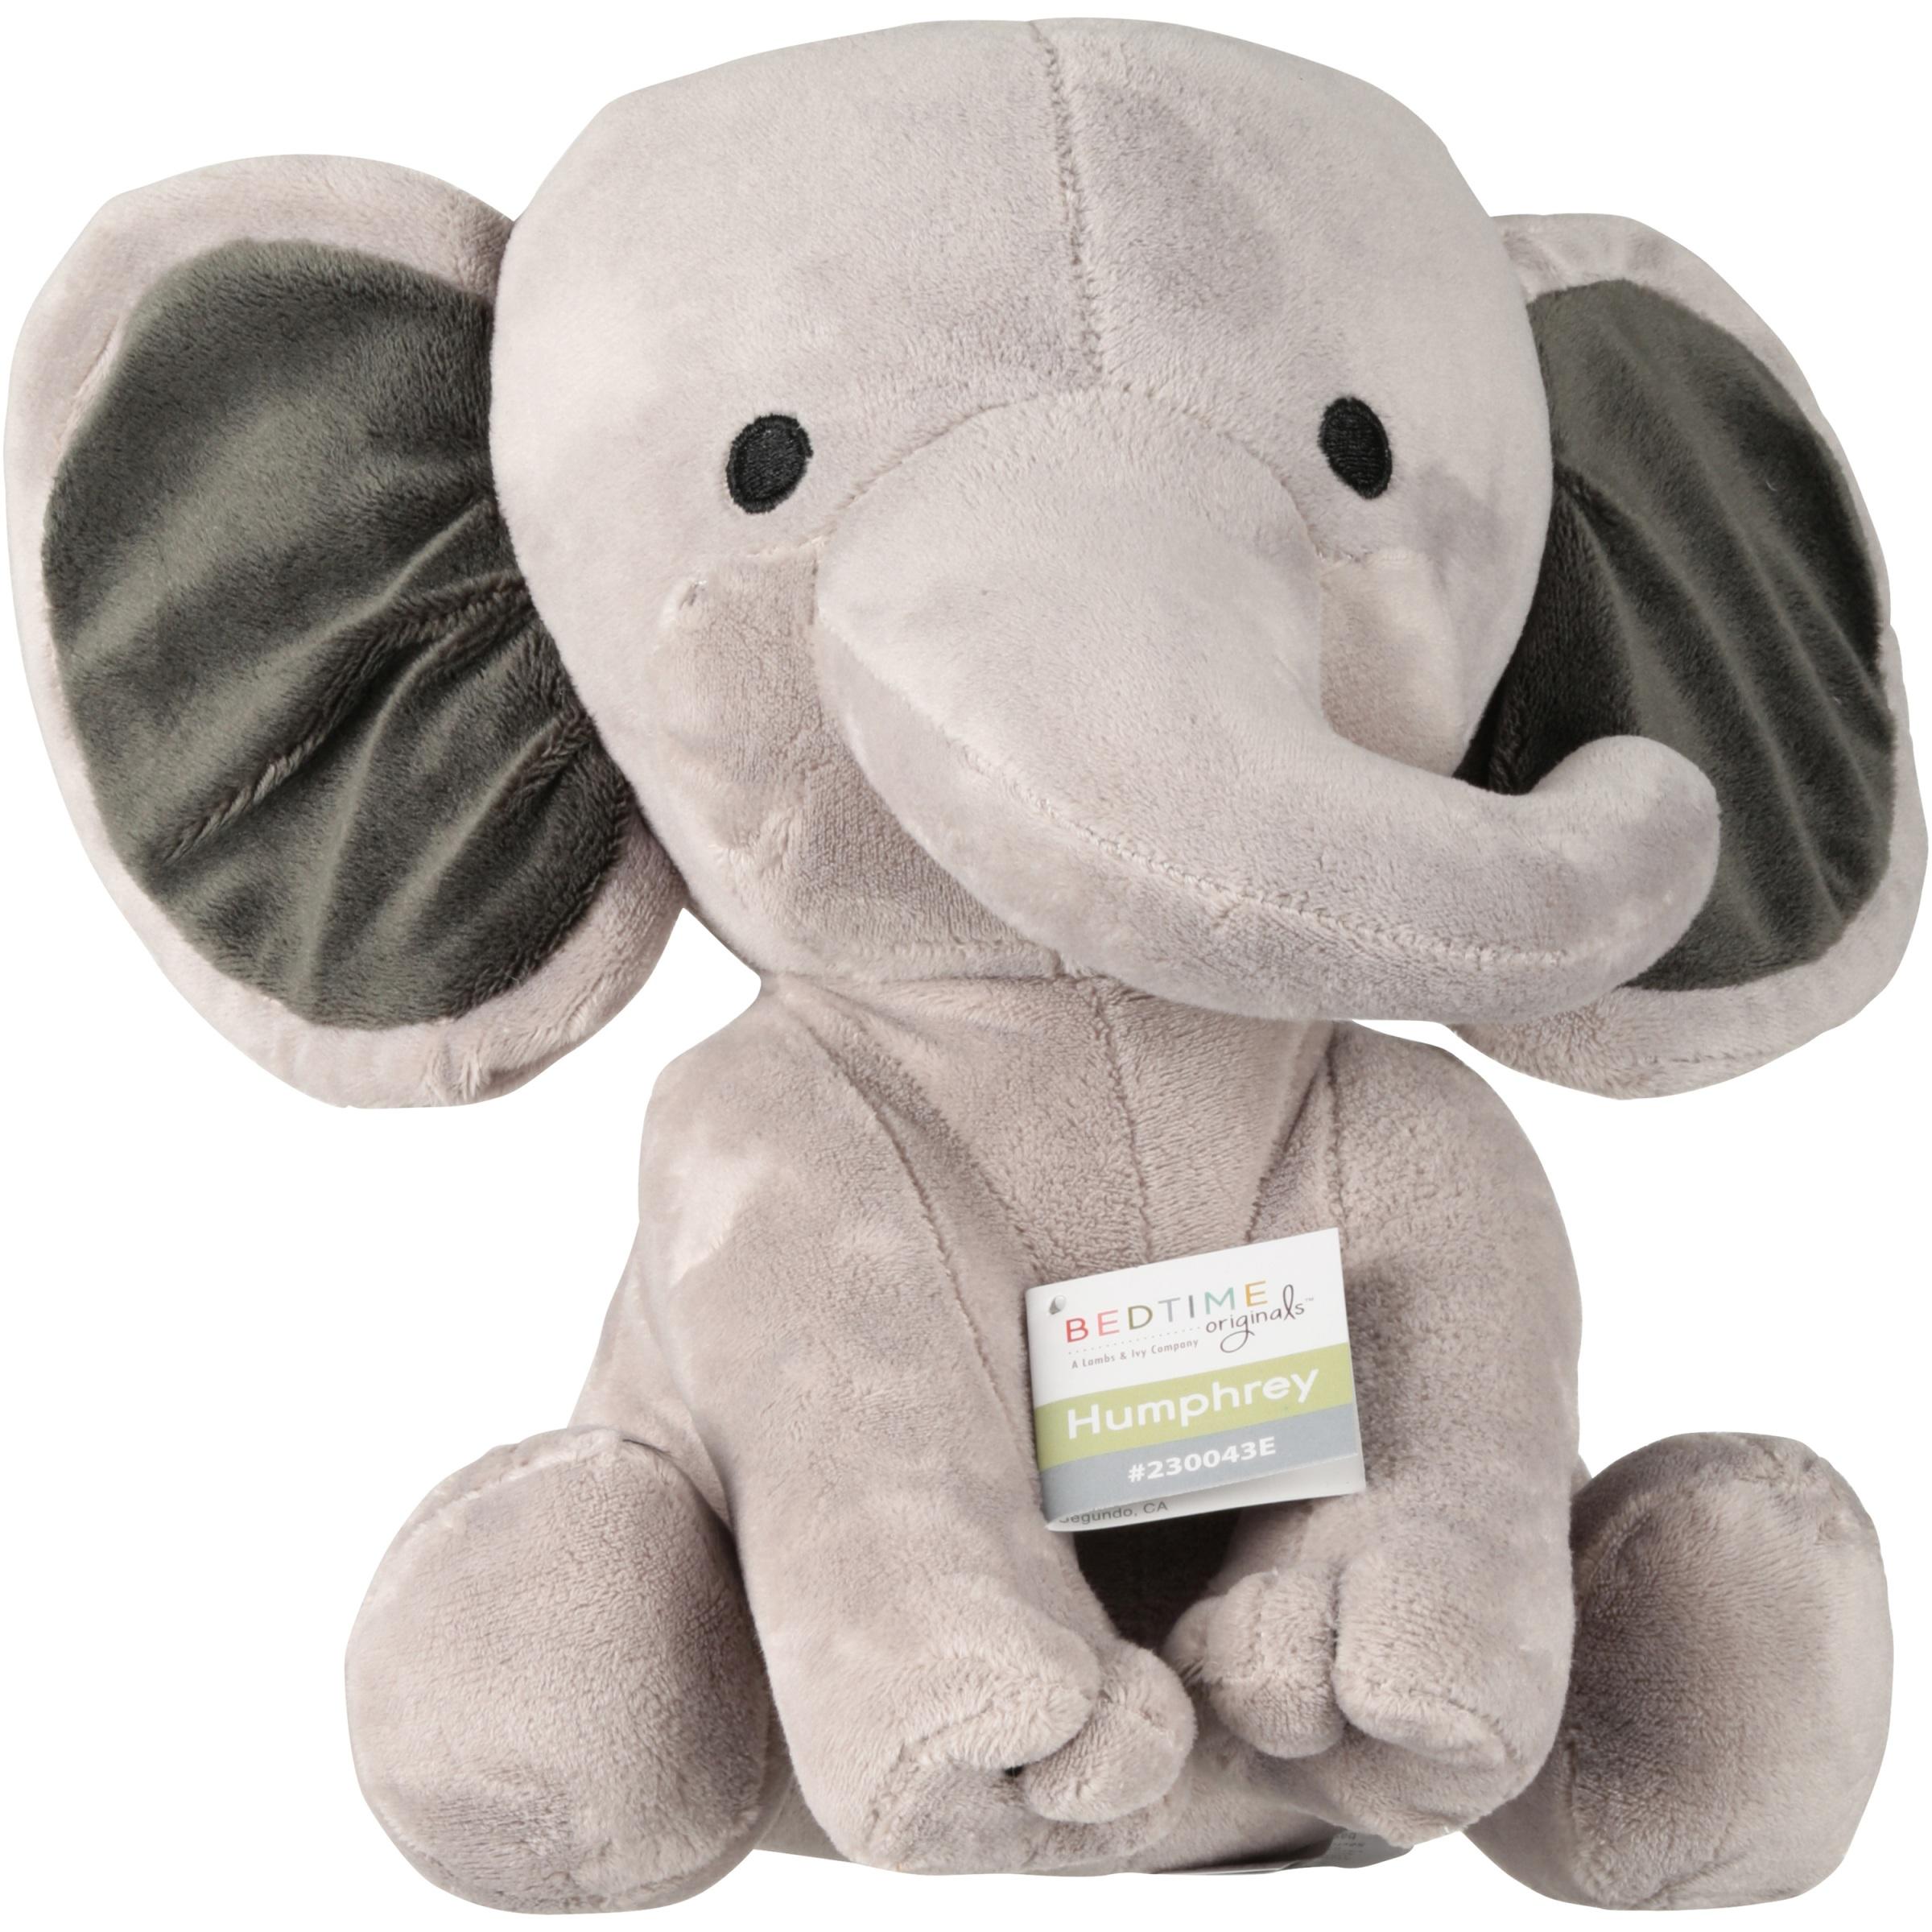 Lambs & Ivy Animal Choo Choo Express Plush Elephant-Humphrey $5